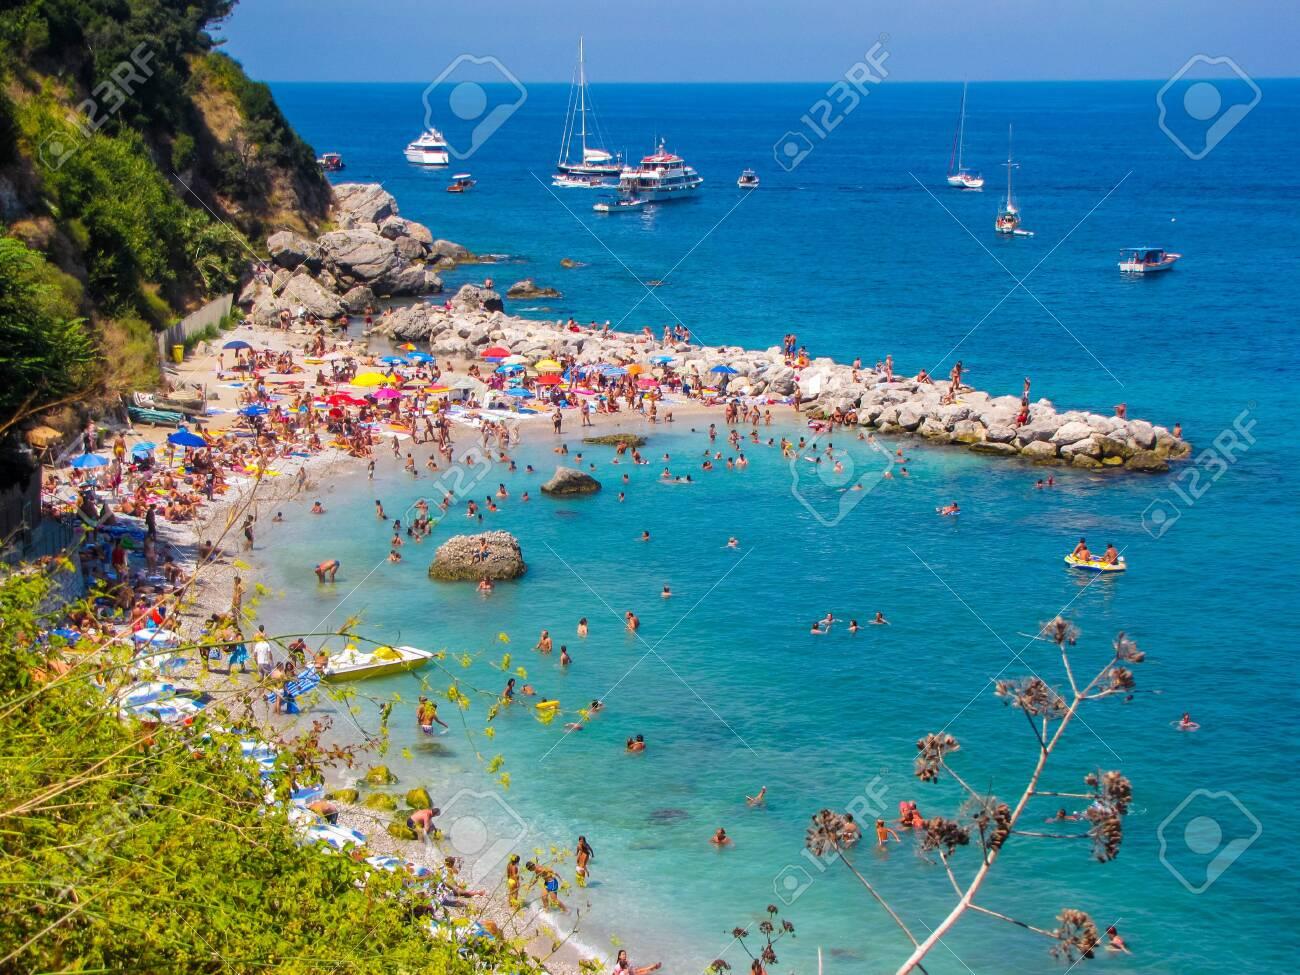 Crowded beach in Capri, Italy - 147819699